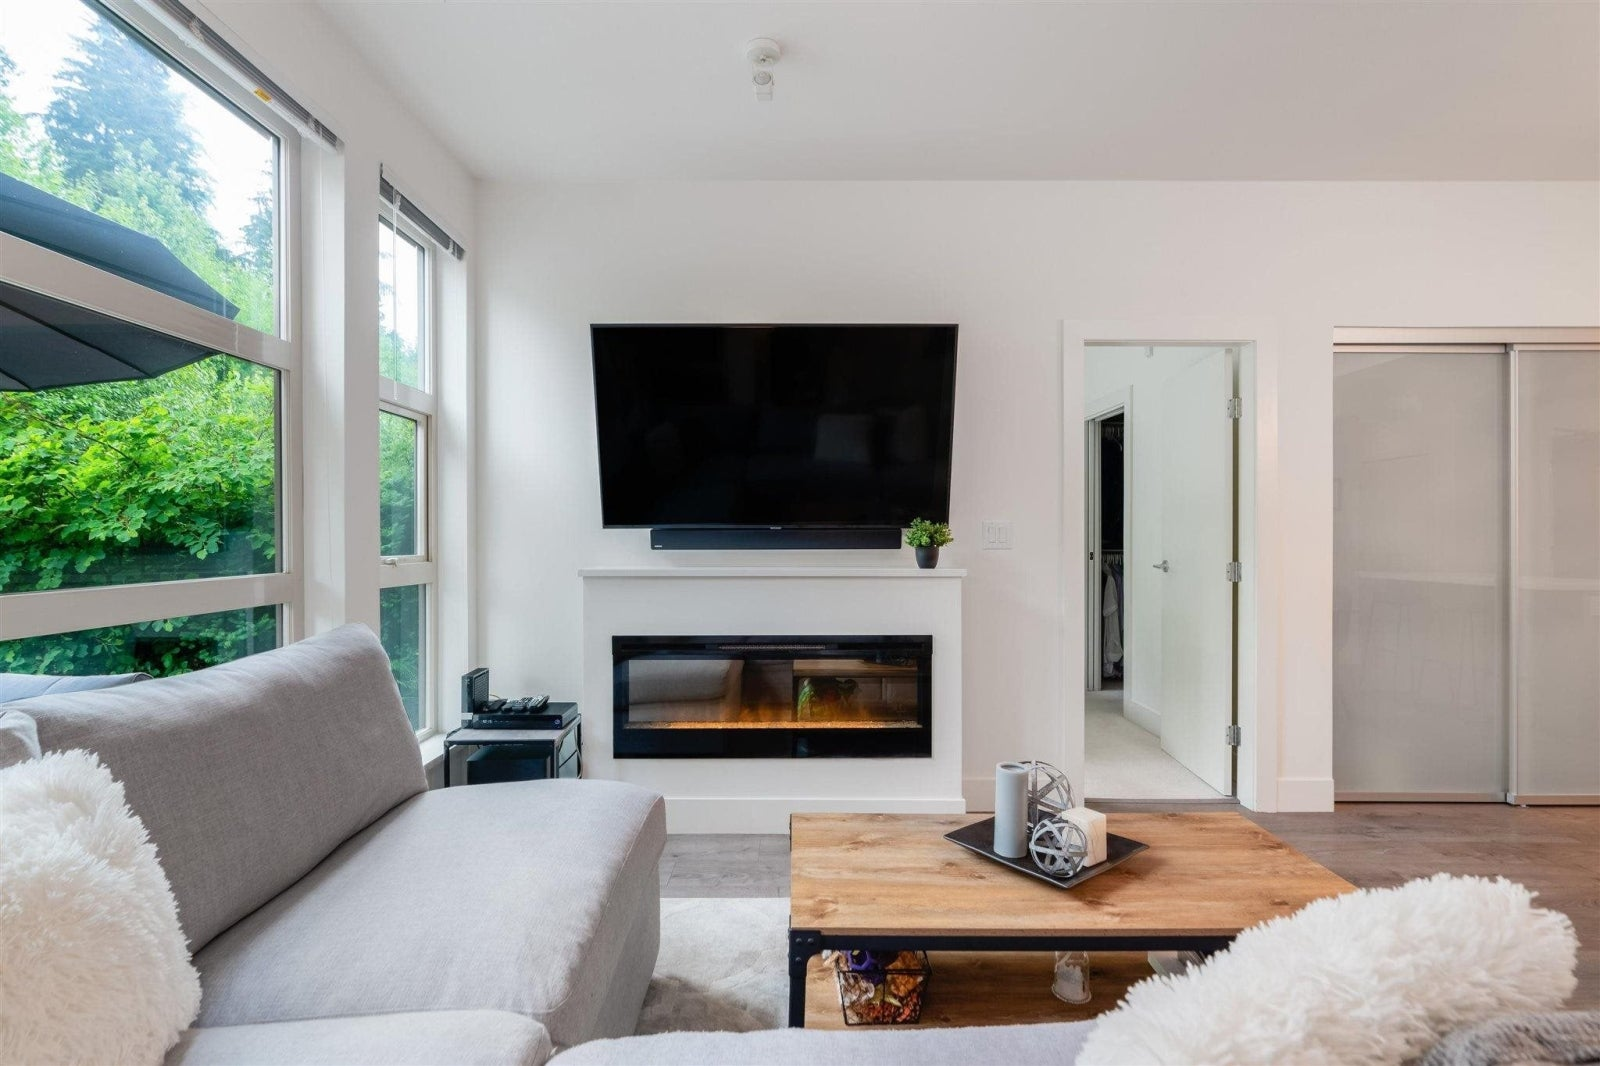 222 3602 ALDERCREST DRIVE - Roche Point Apartment/Condo for sale, 2 Bedrooms (R2603975) #3